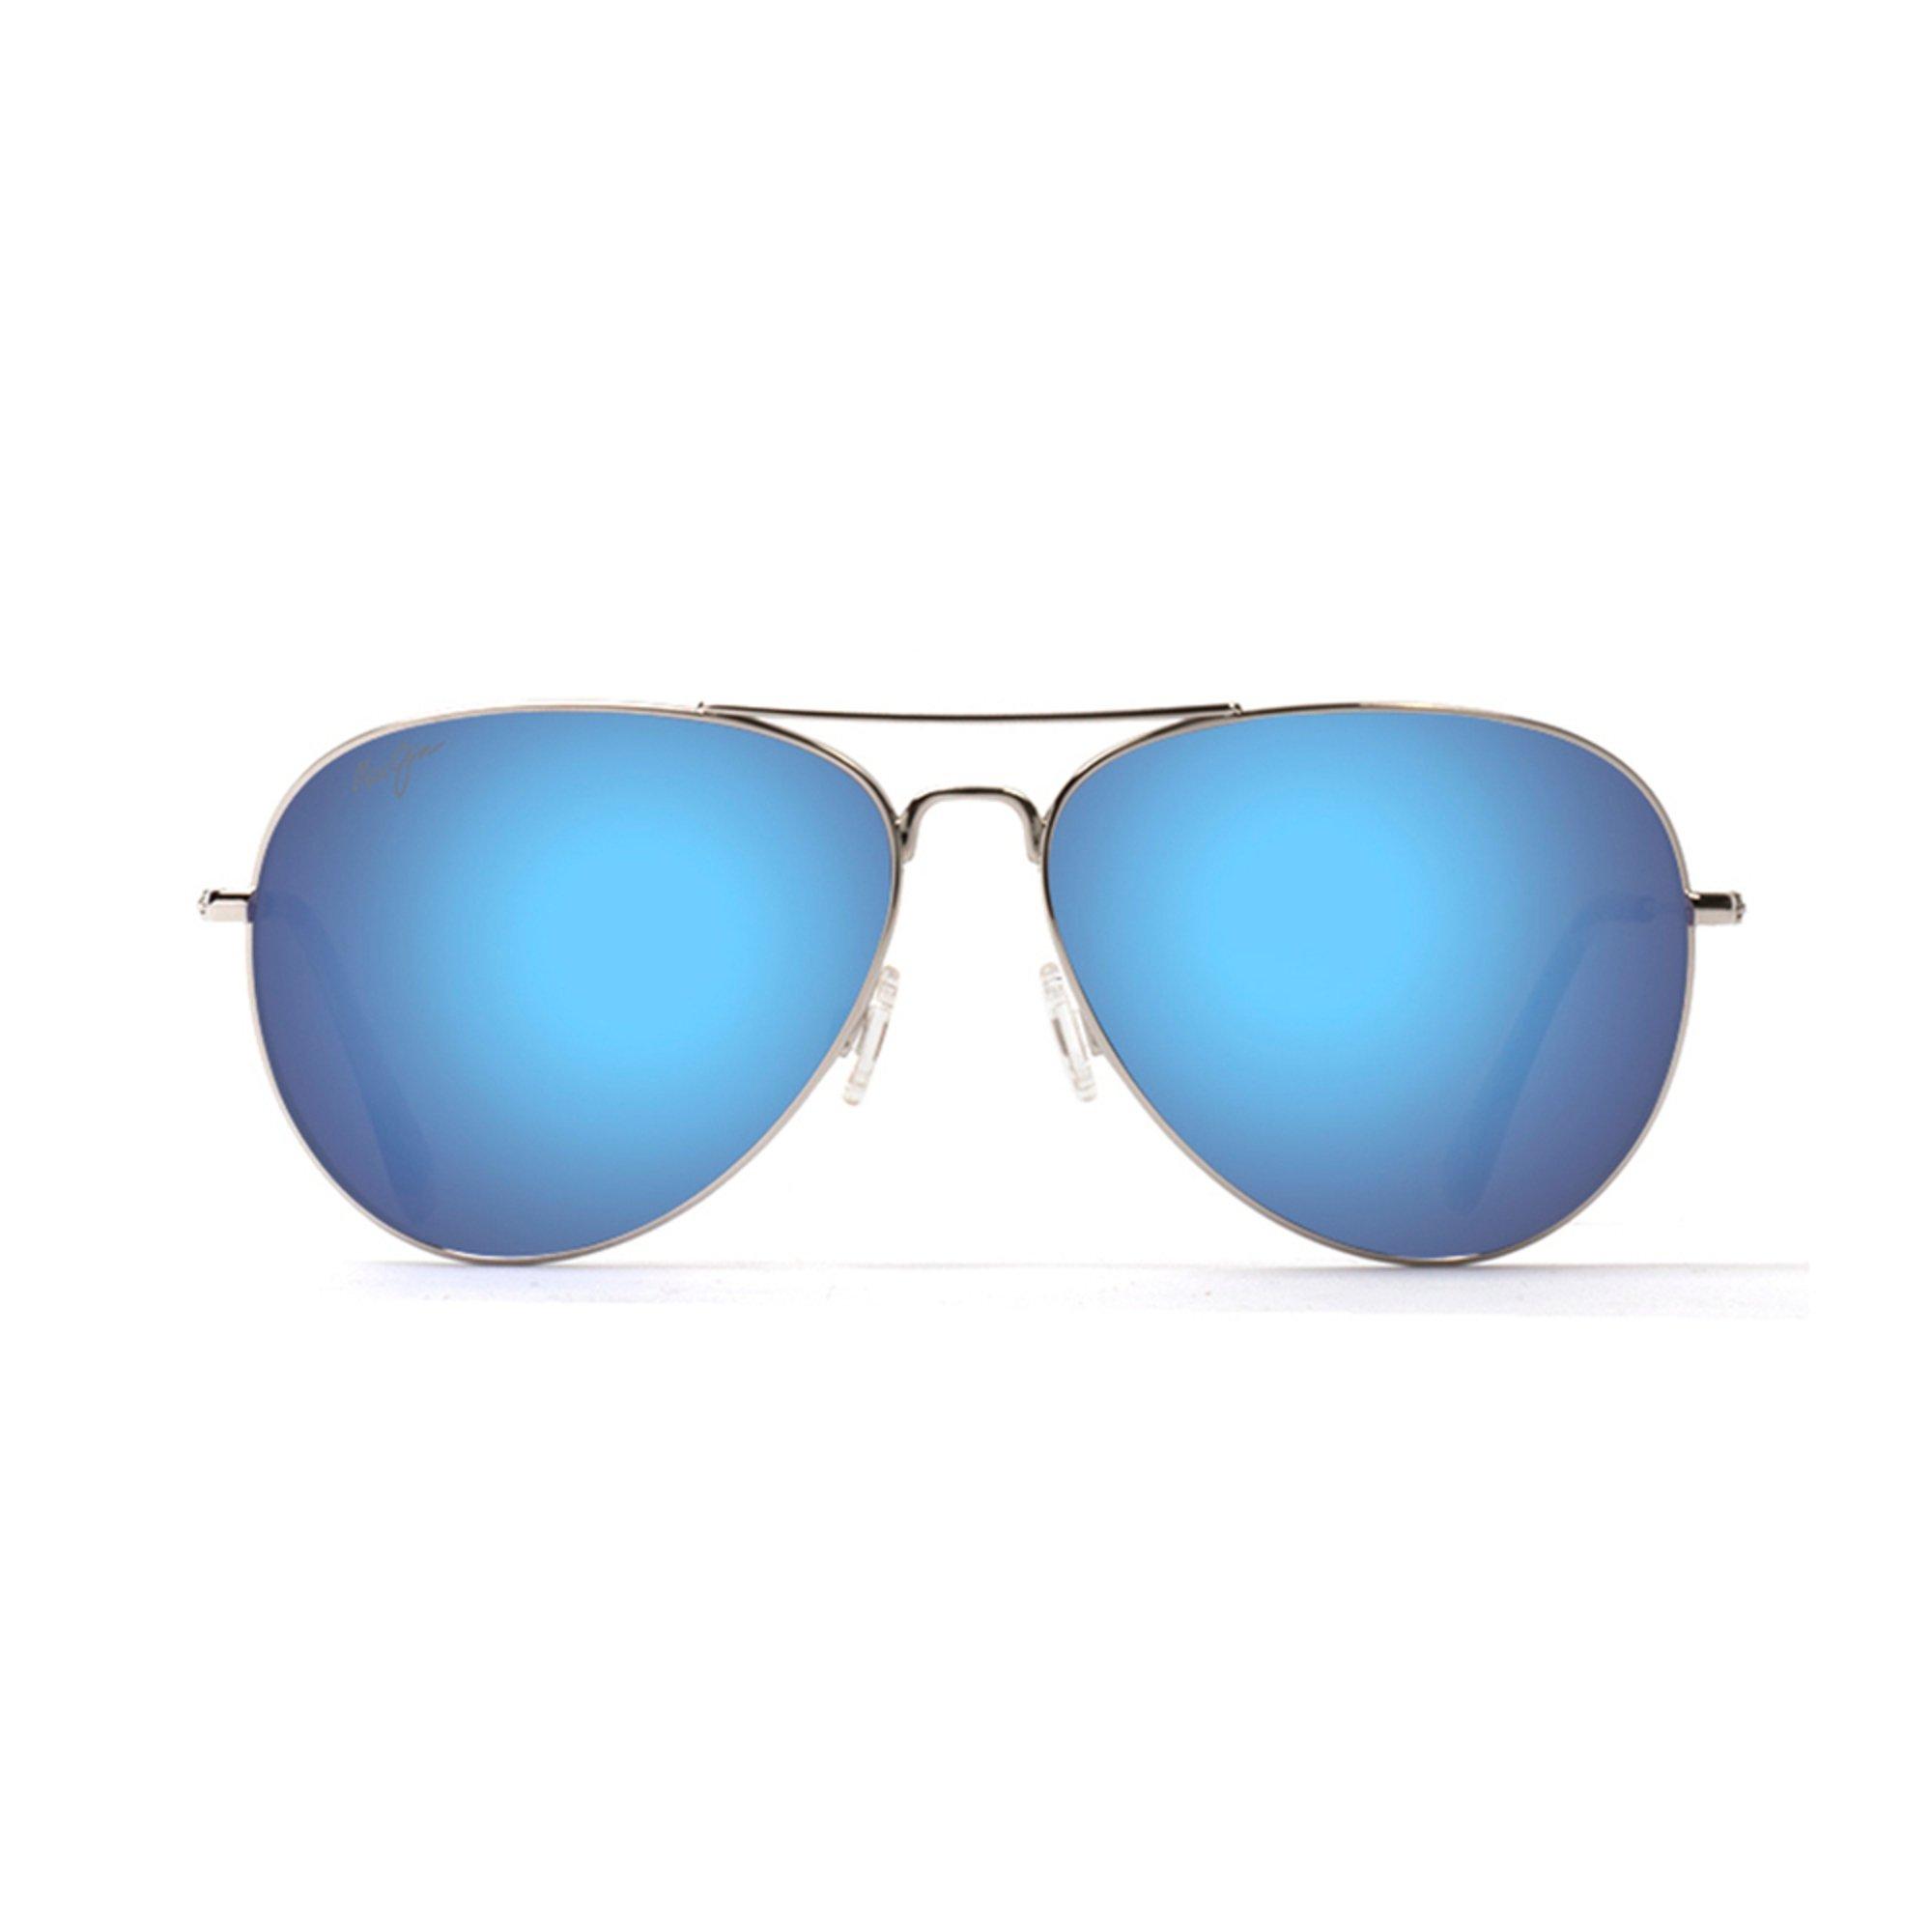 1e26ee85e0f83 Maui Jim. Maui Jim Unisex Polarized Mavericks Blue Hawaii Sunglasses